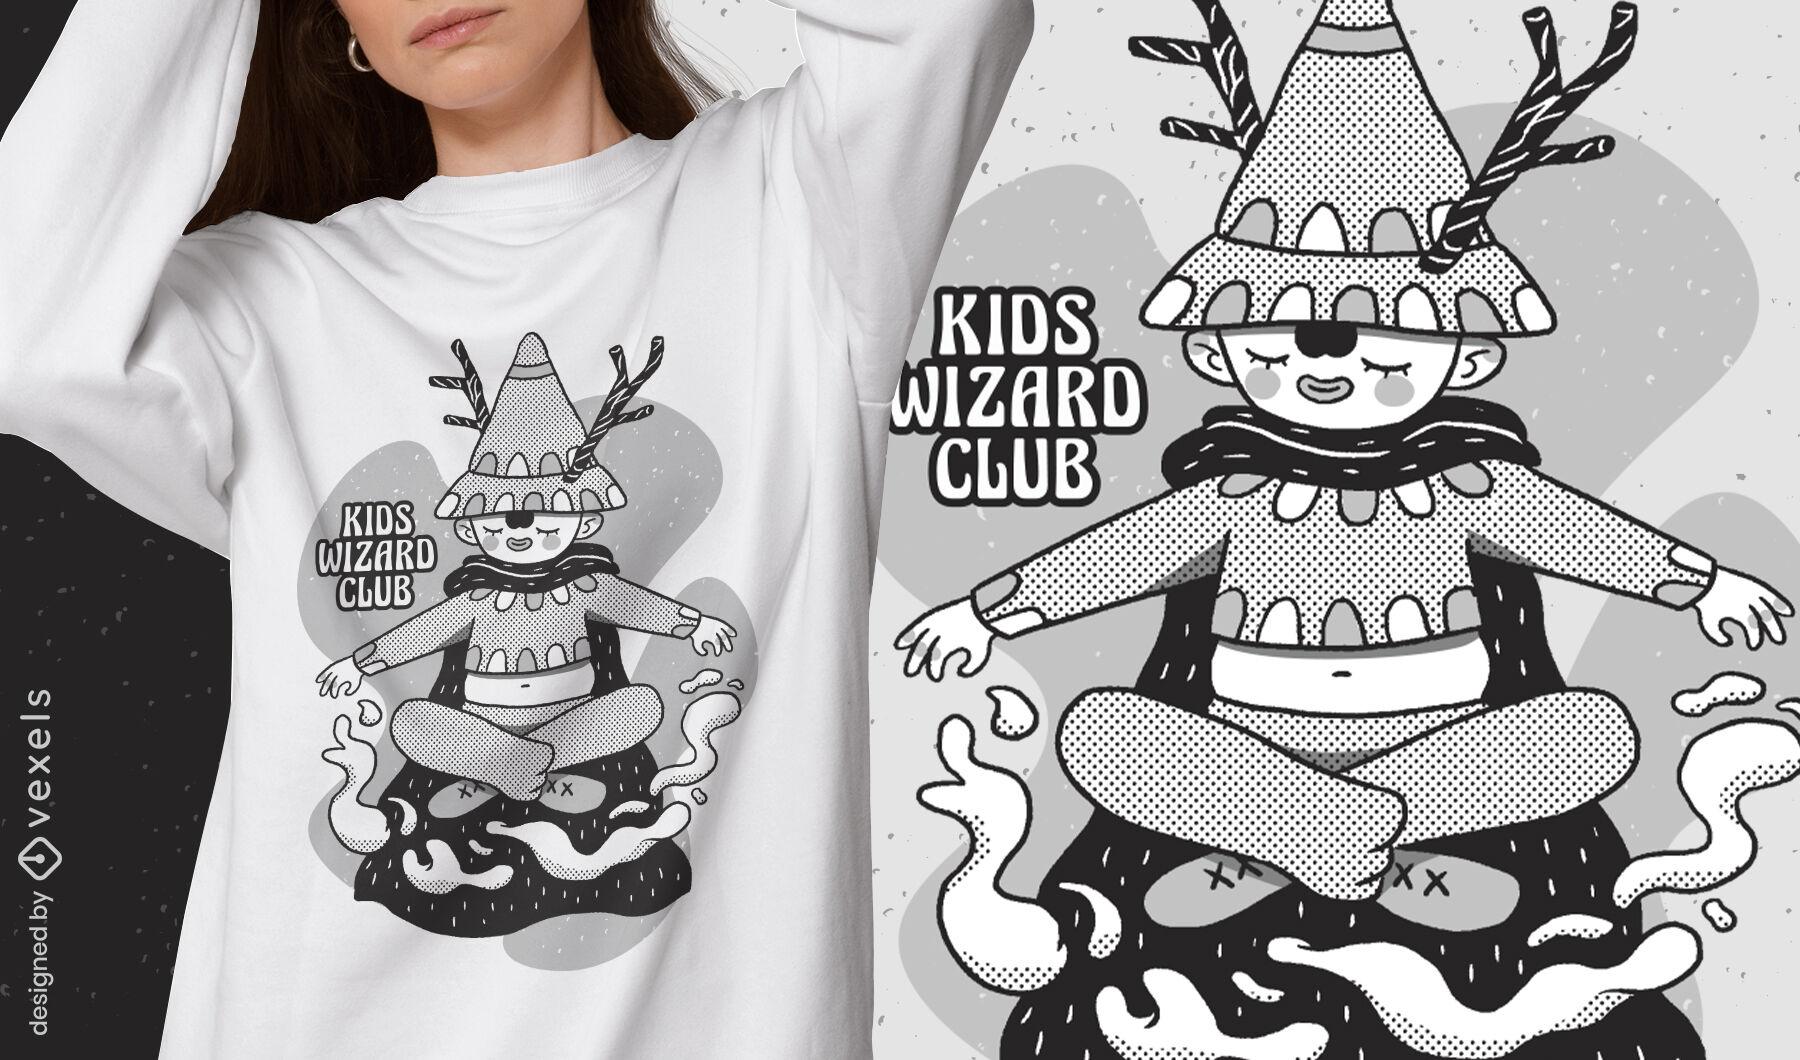 Cartoon wizard kid fantasy t-shirt design